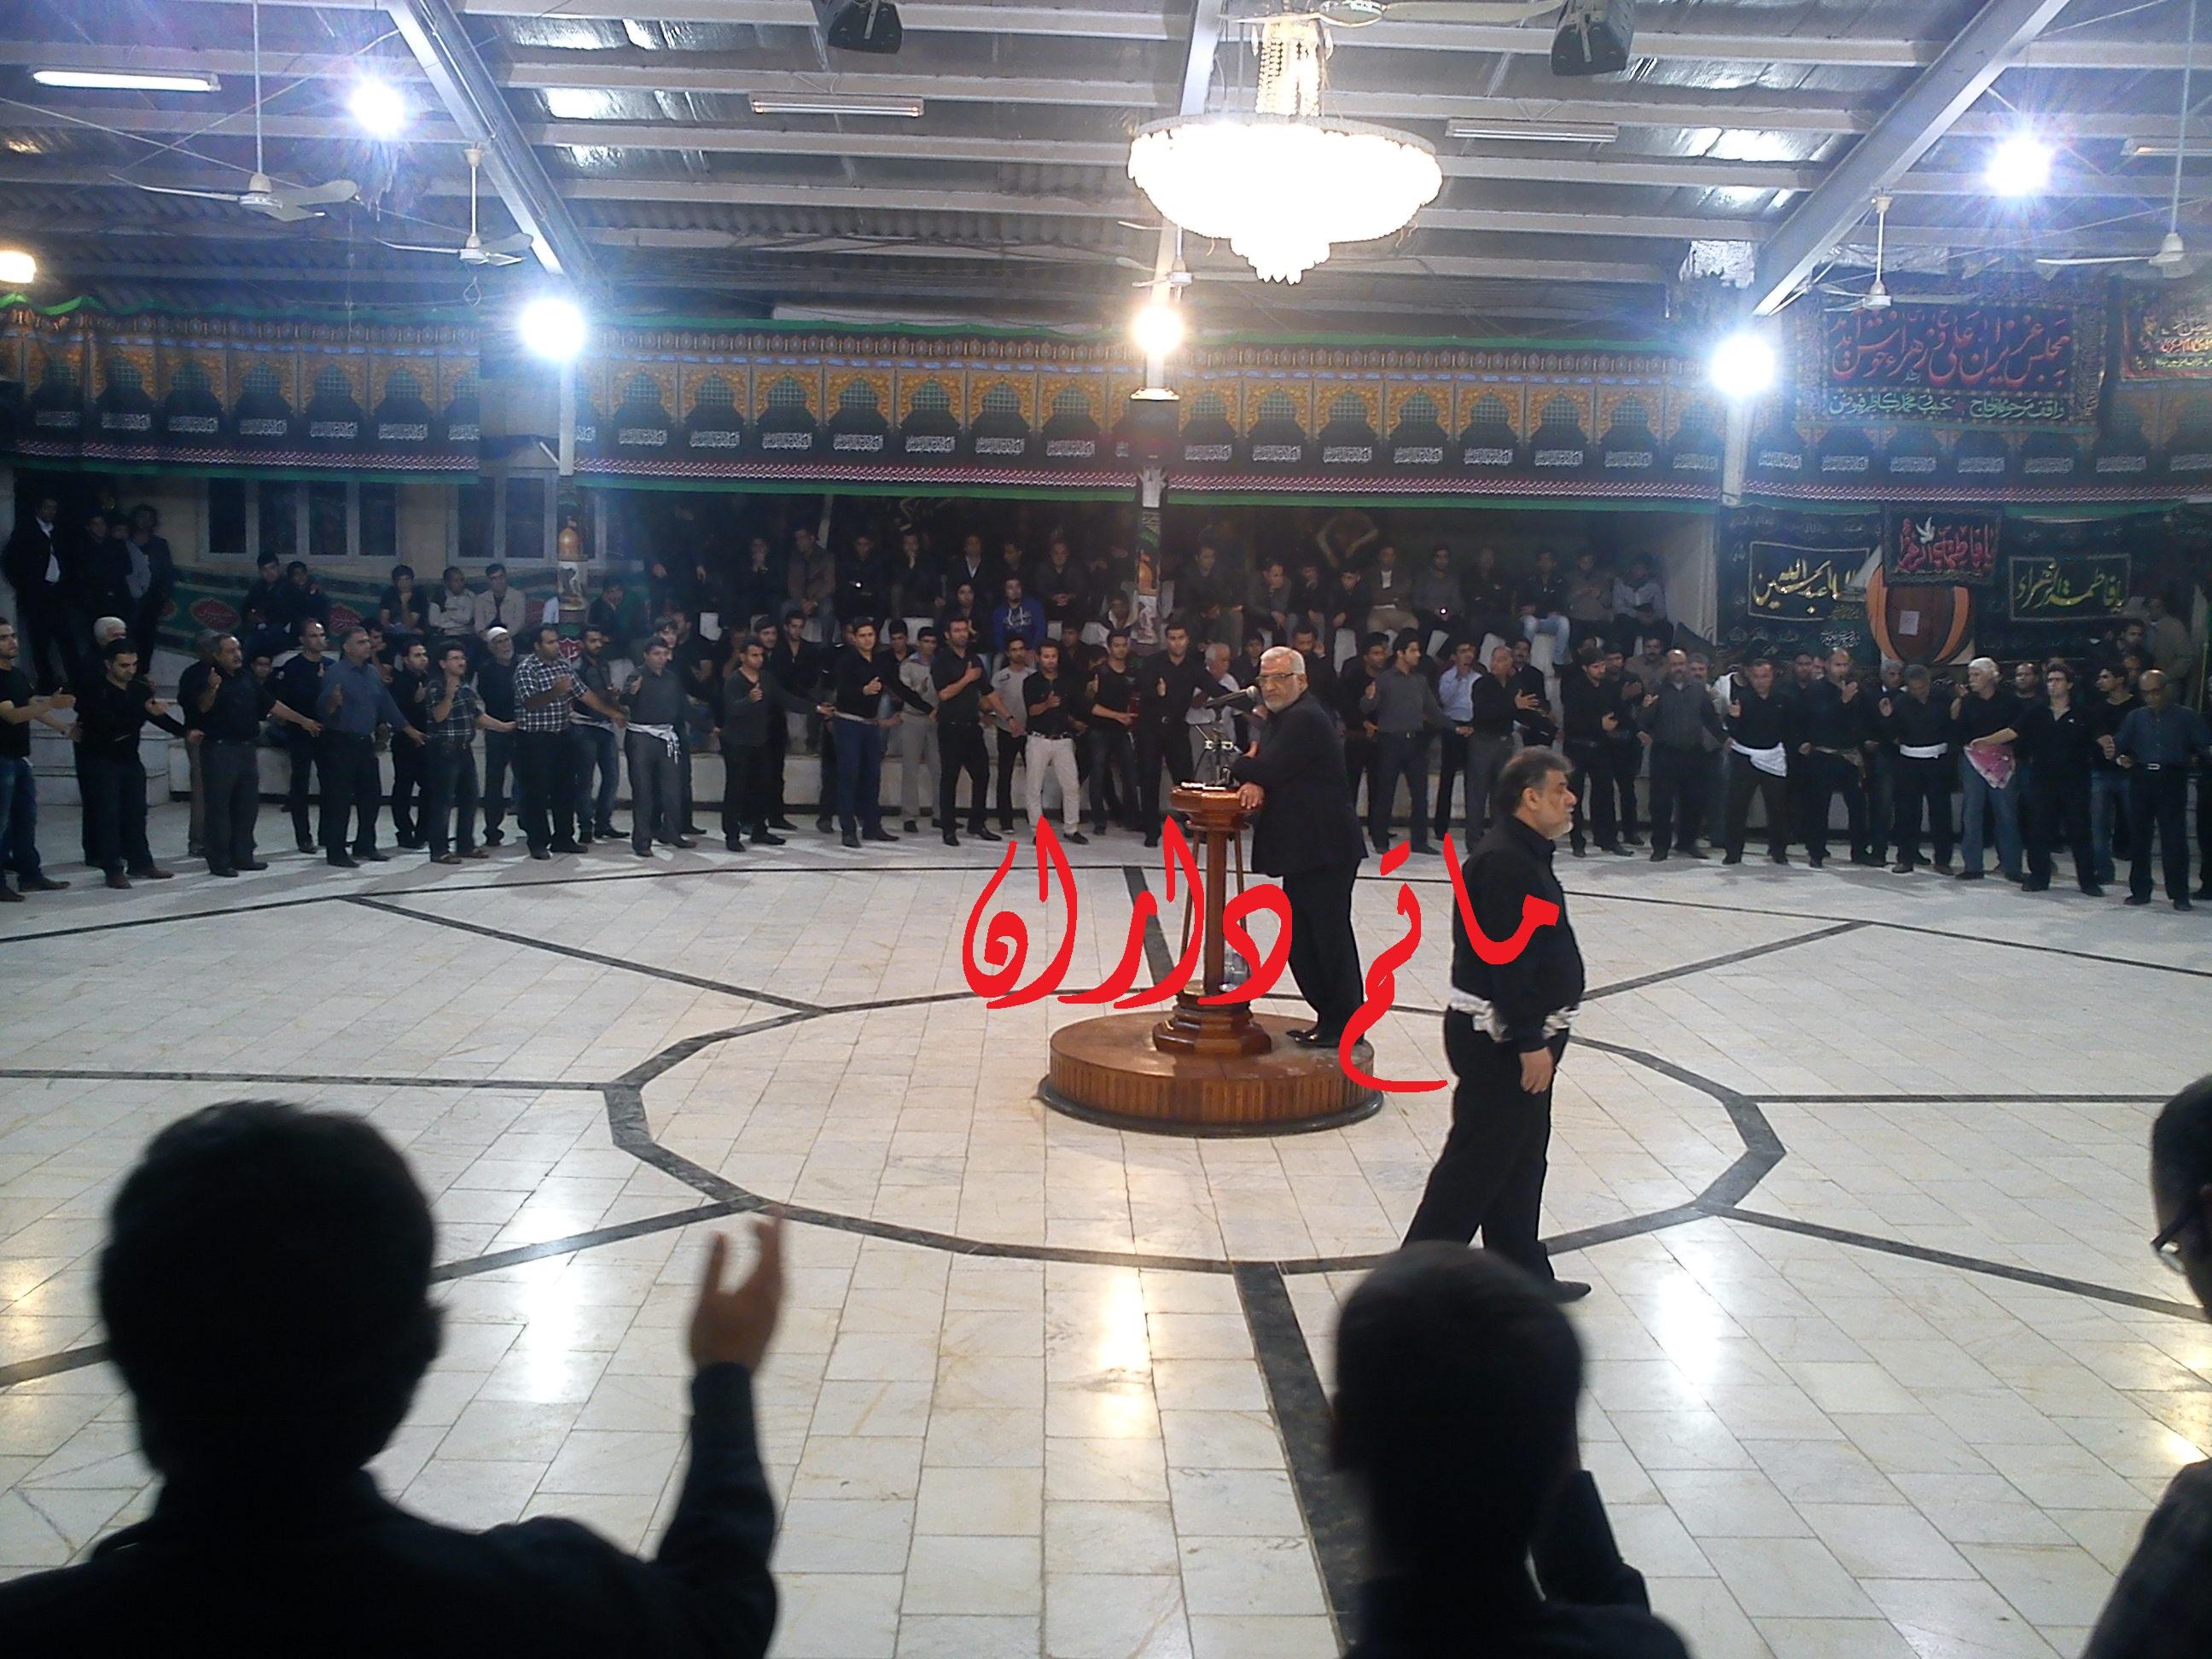 حاج مصطفی گراشی / مسجد دهدشتی